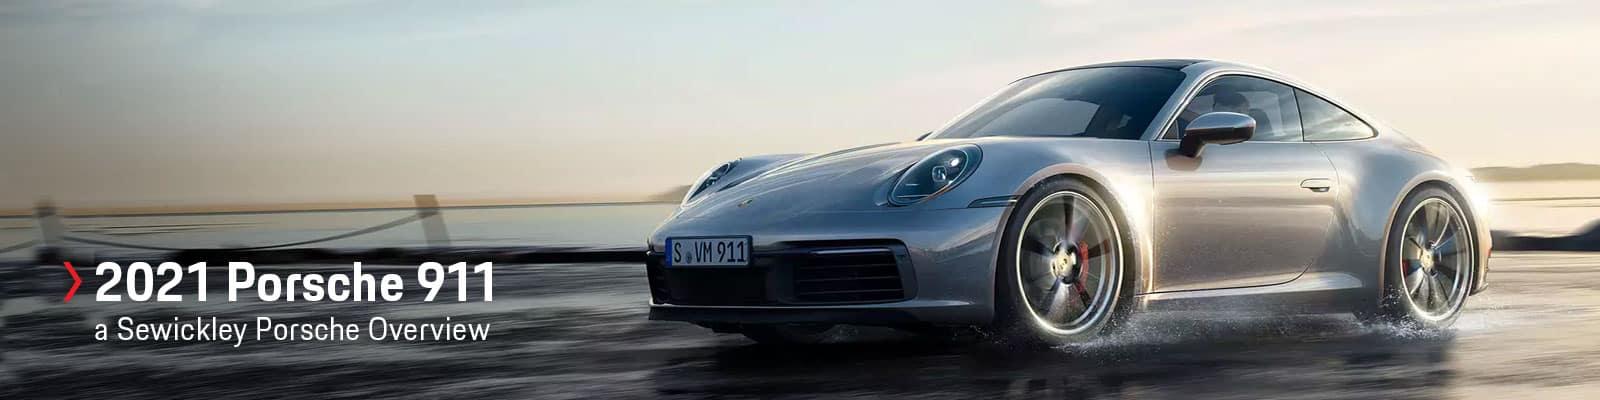 2021 Porsche 911 Model Overview at Sewickley Porsche